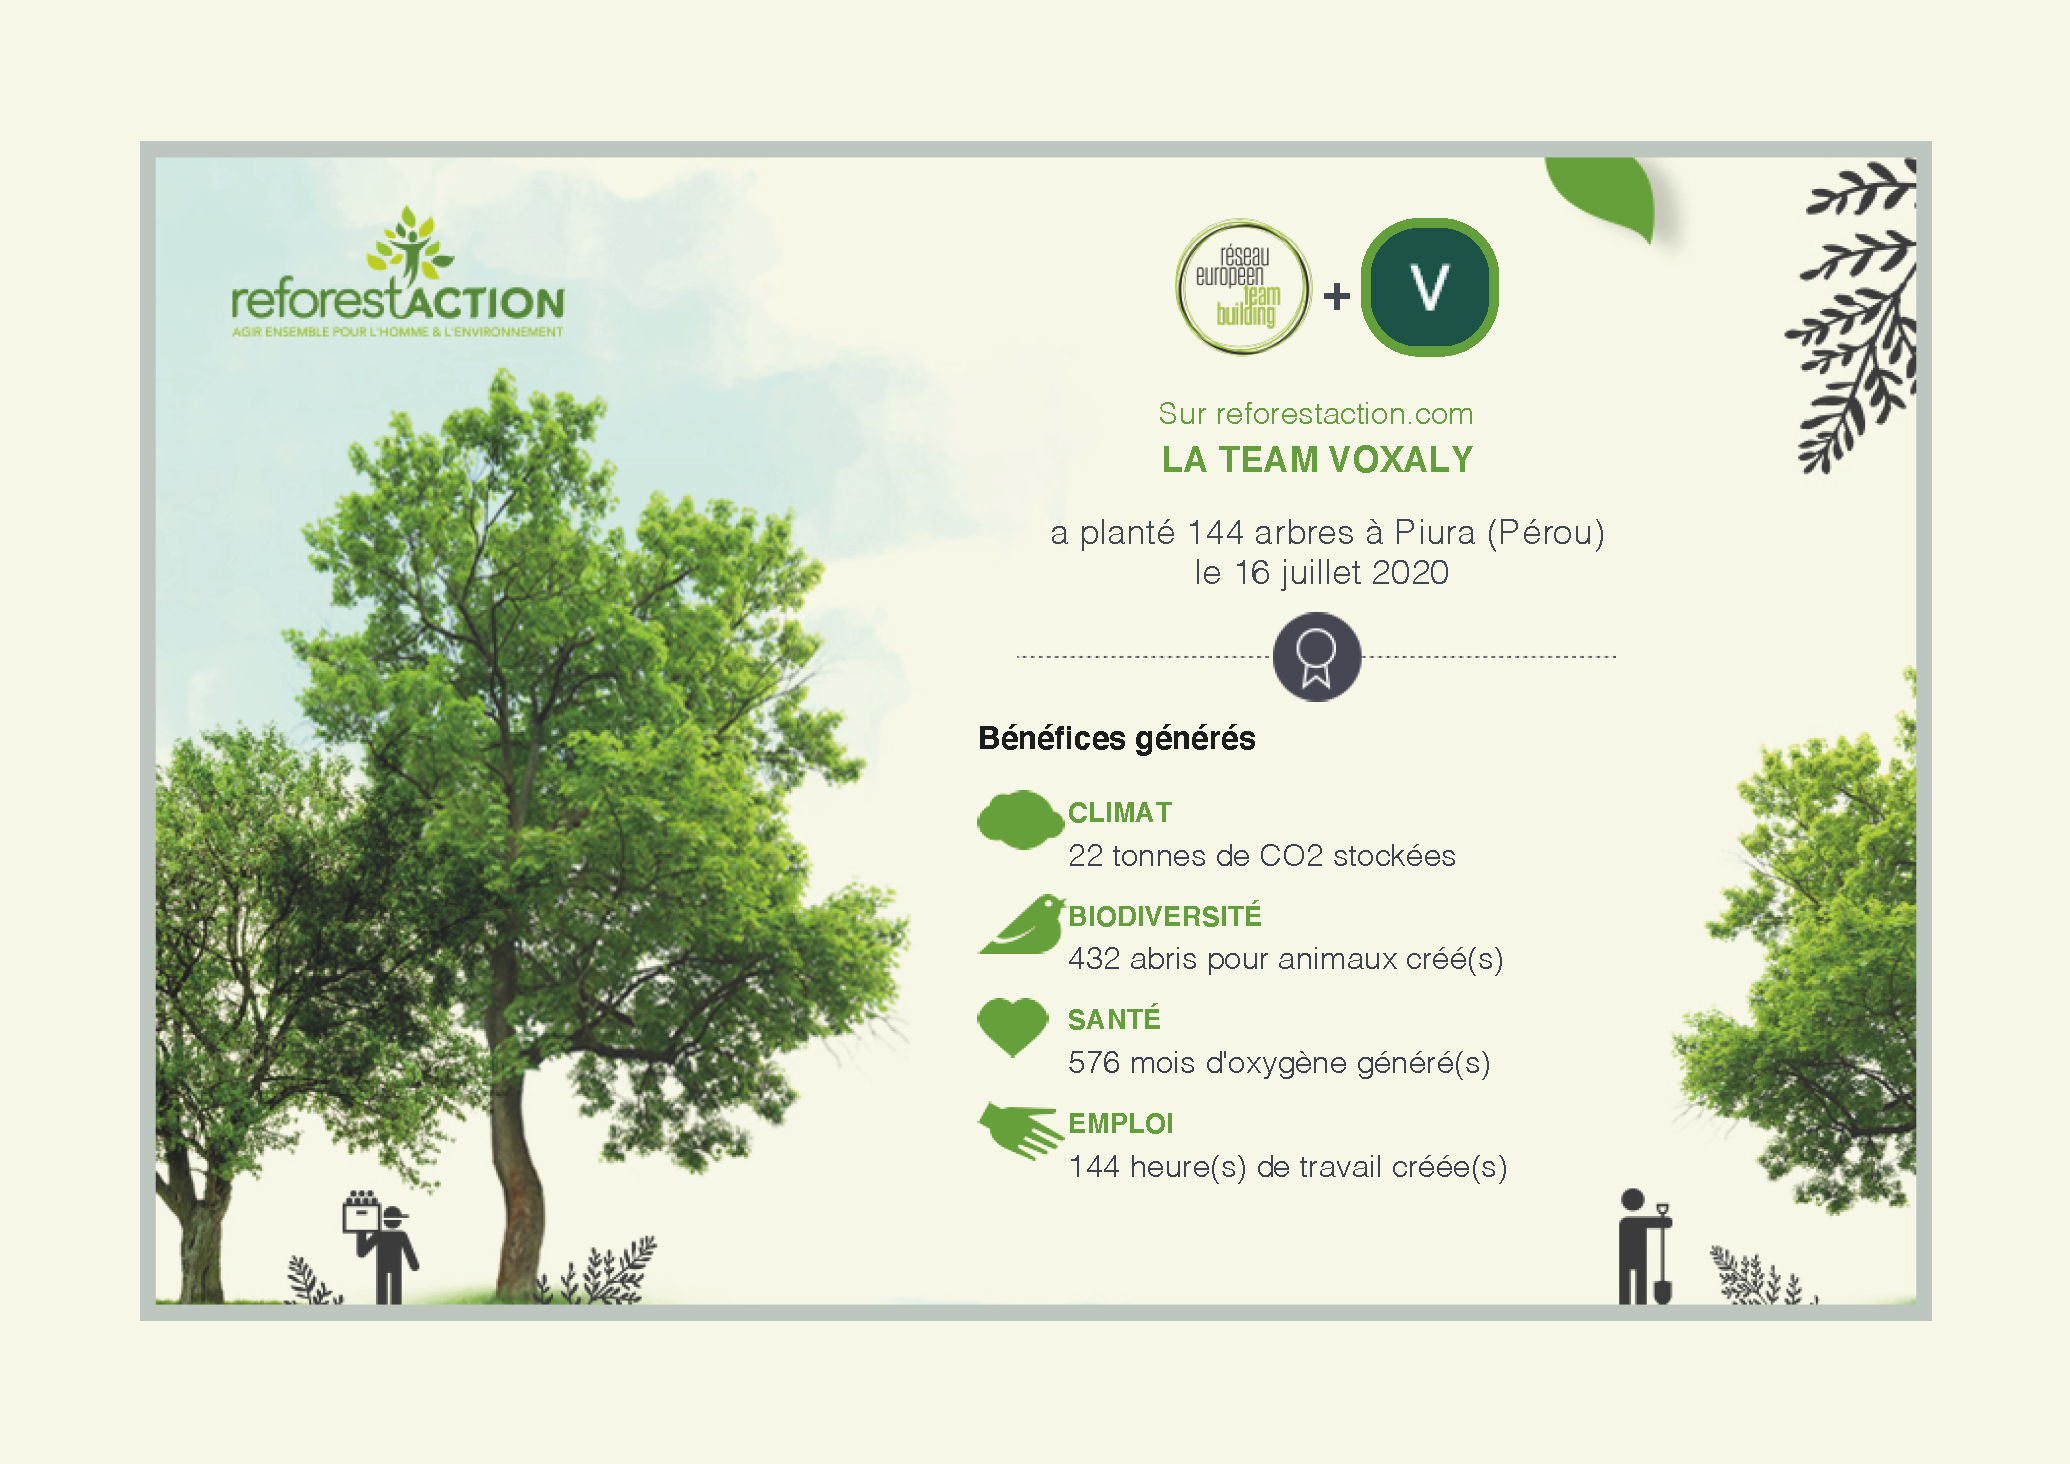 Certificat Voxaly reforestation